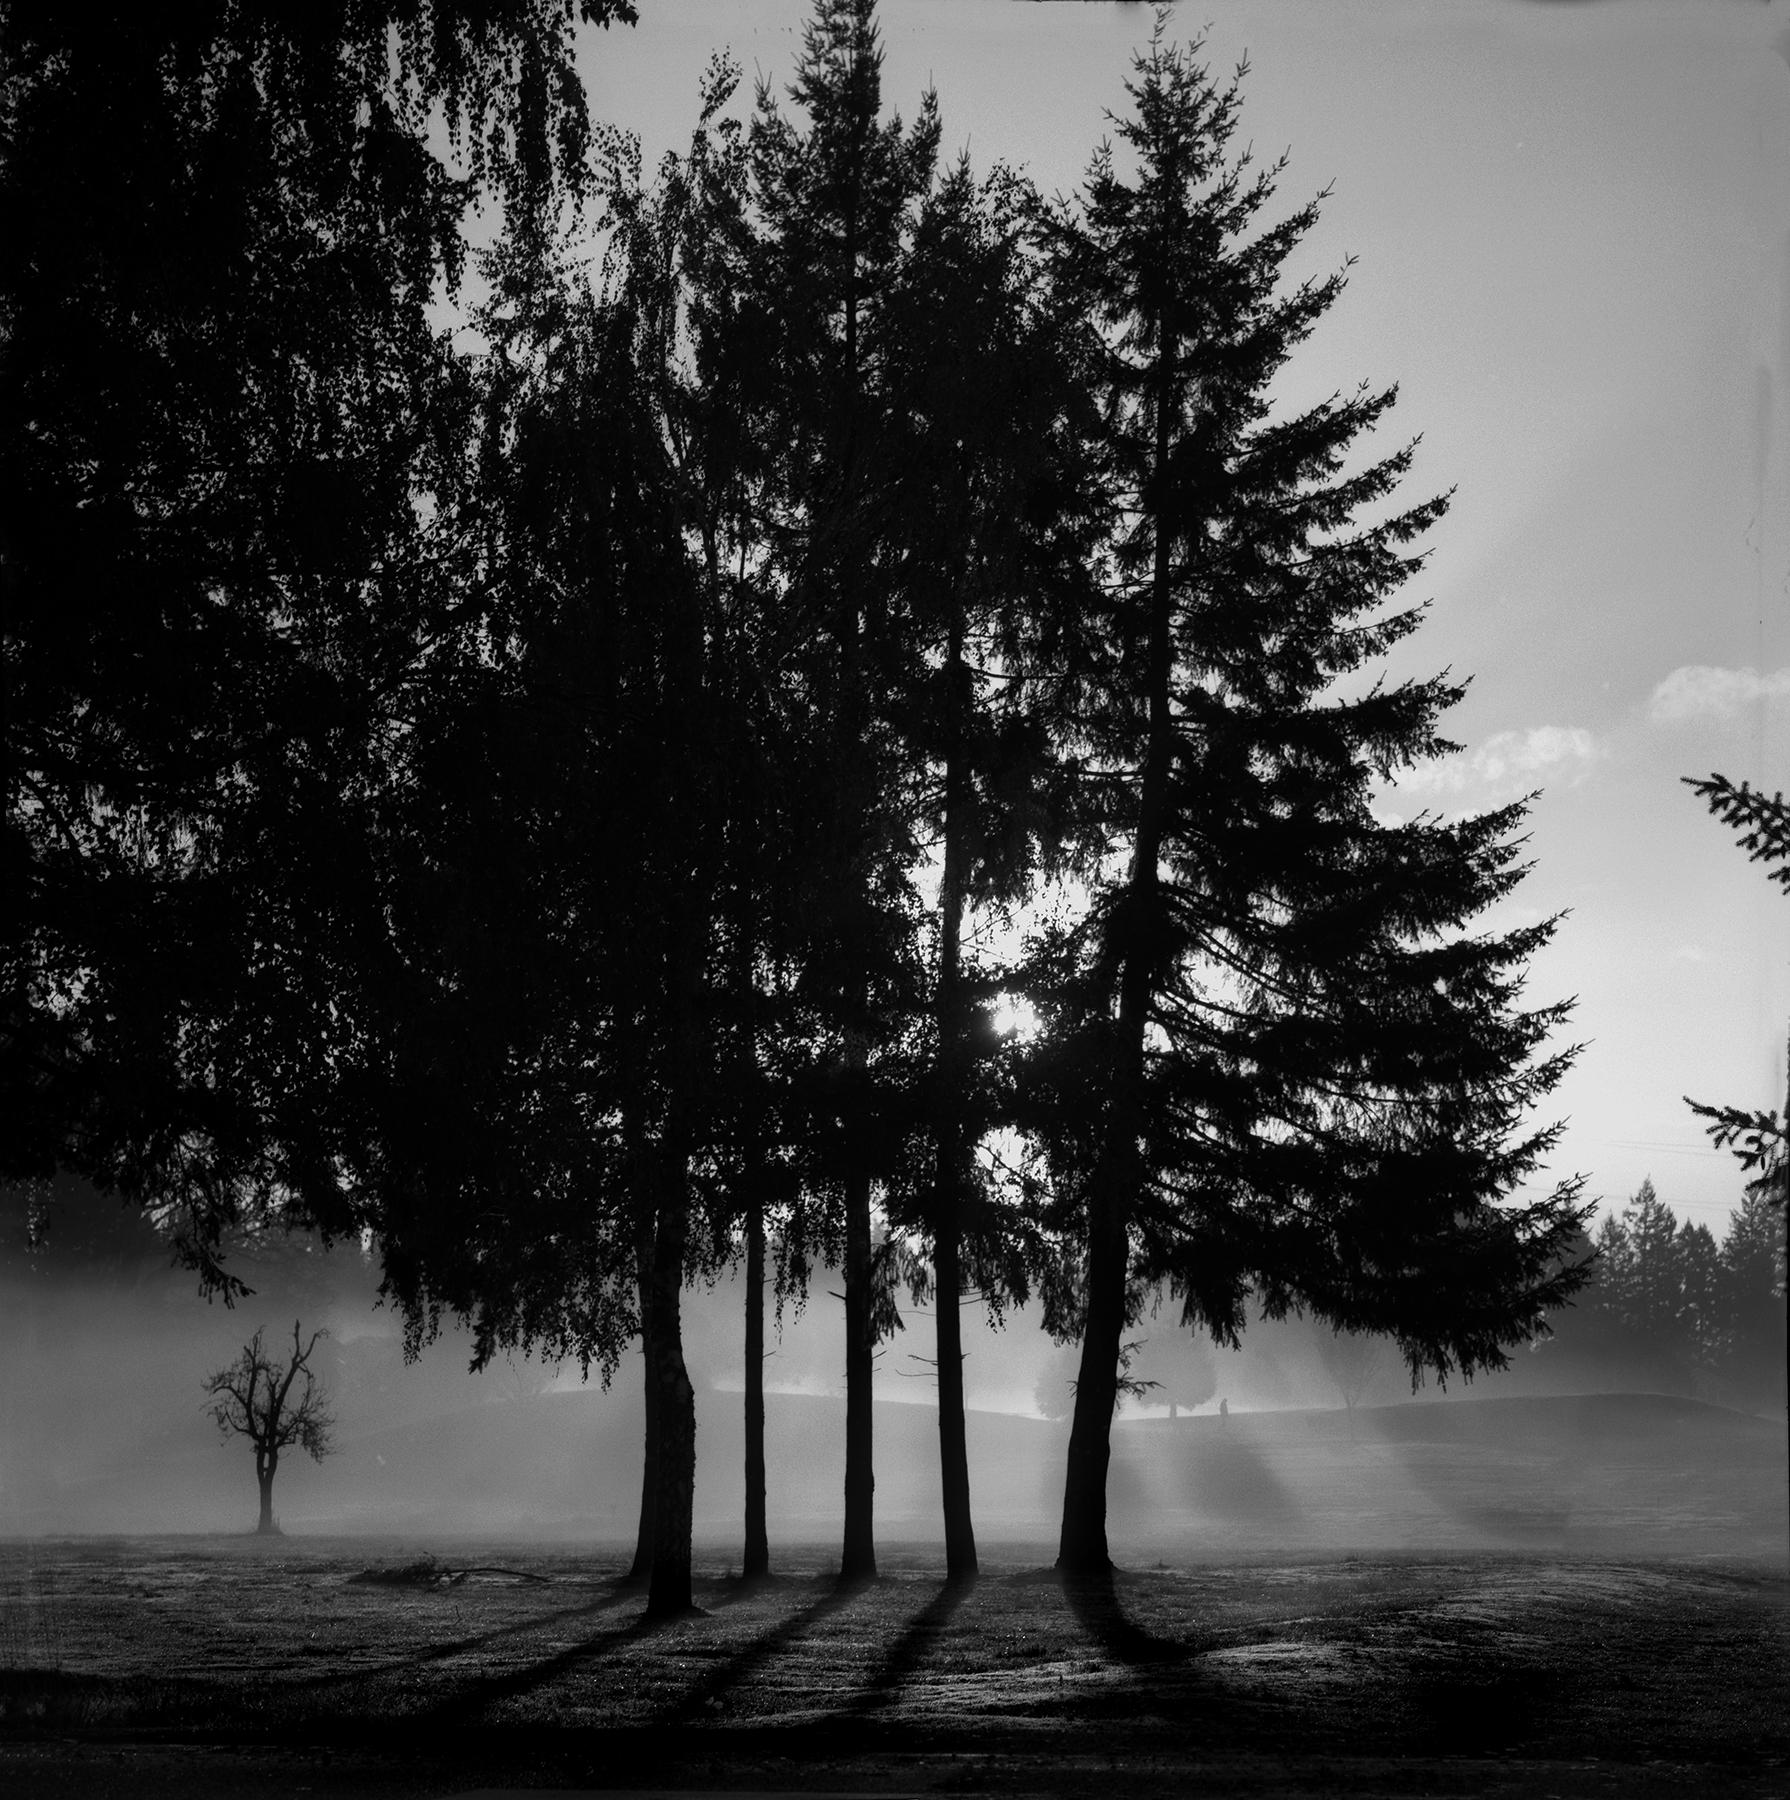 Fog_Hasselblad-500c_Sonar150mmF4_Kelly-ShaneFuller.jpg